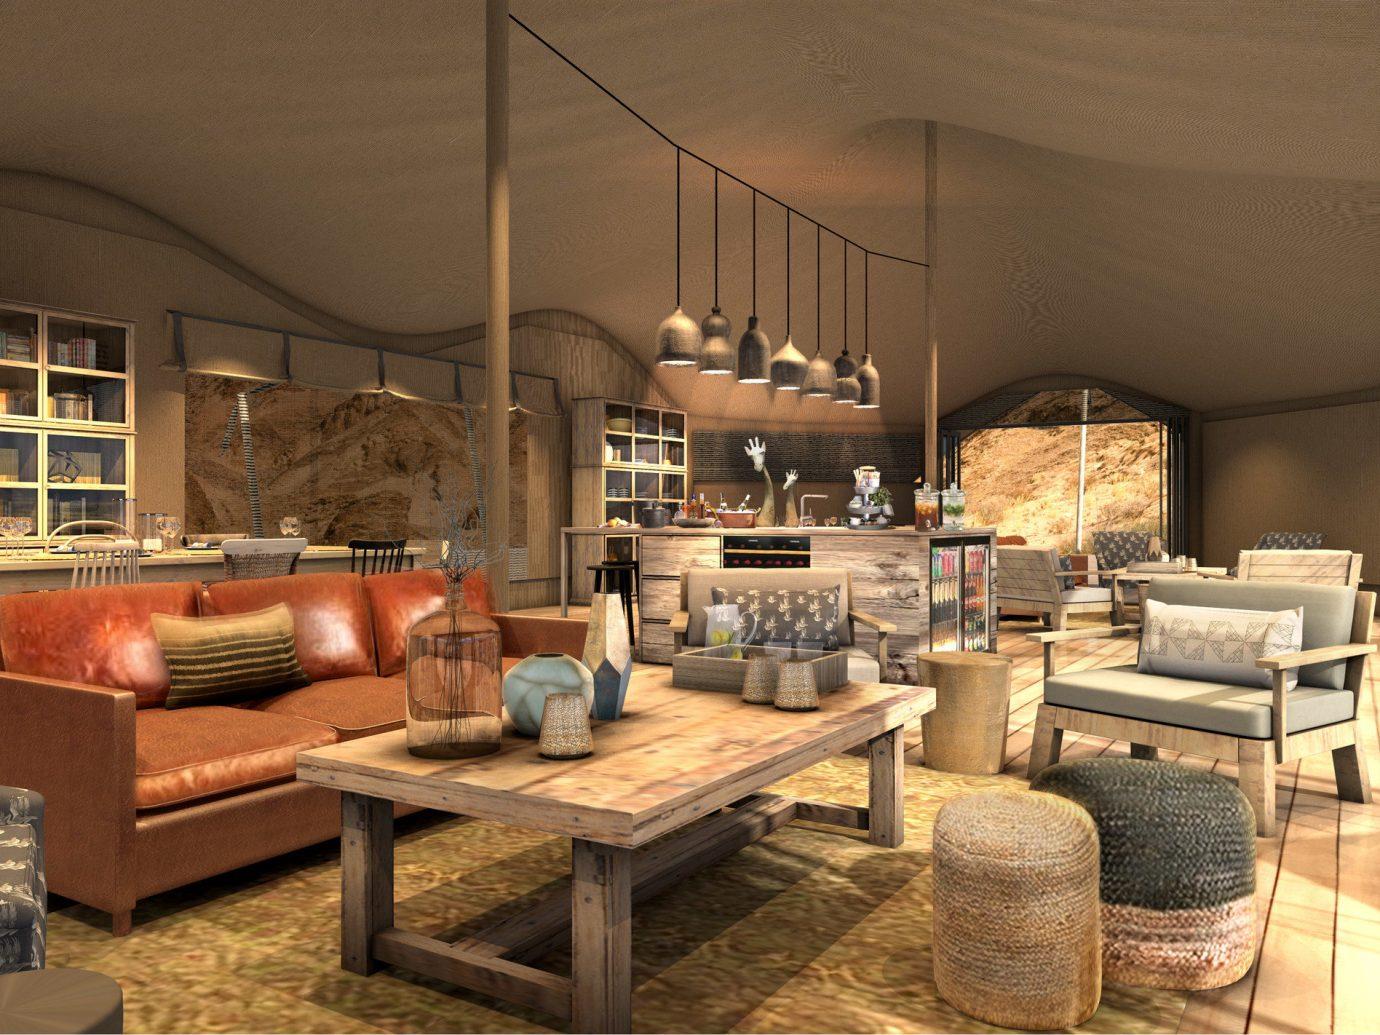 africa Honeymoon Namibia Romance Trip Ideas table indoor floor room chair Living living room interior design furniture loft interior designer area